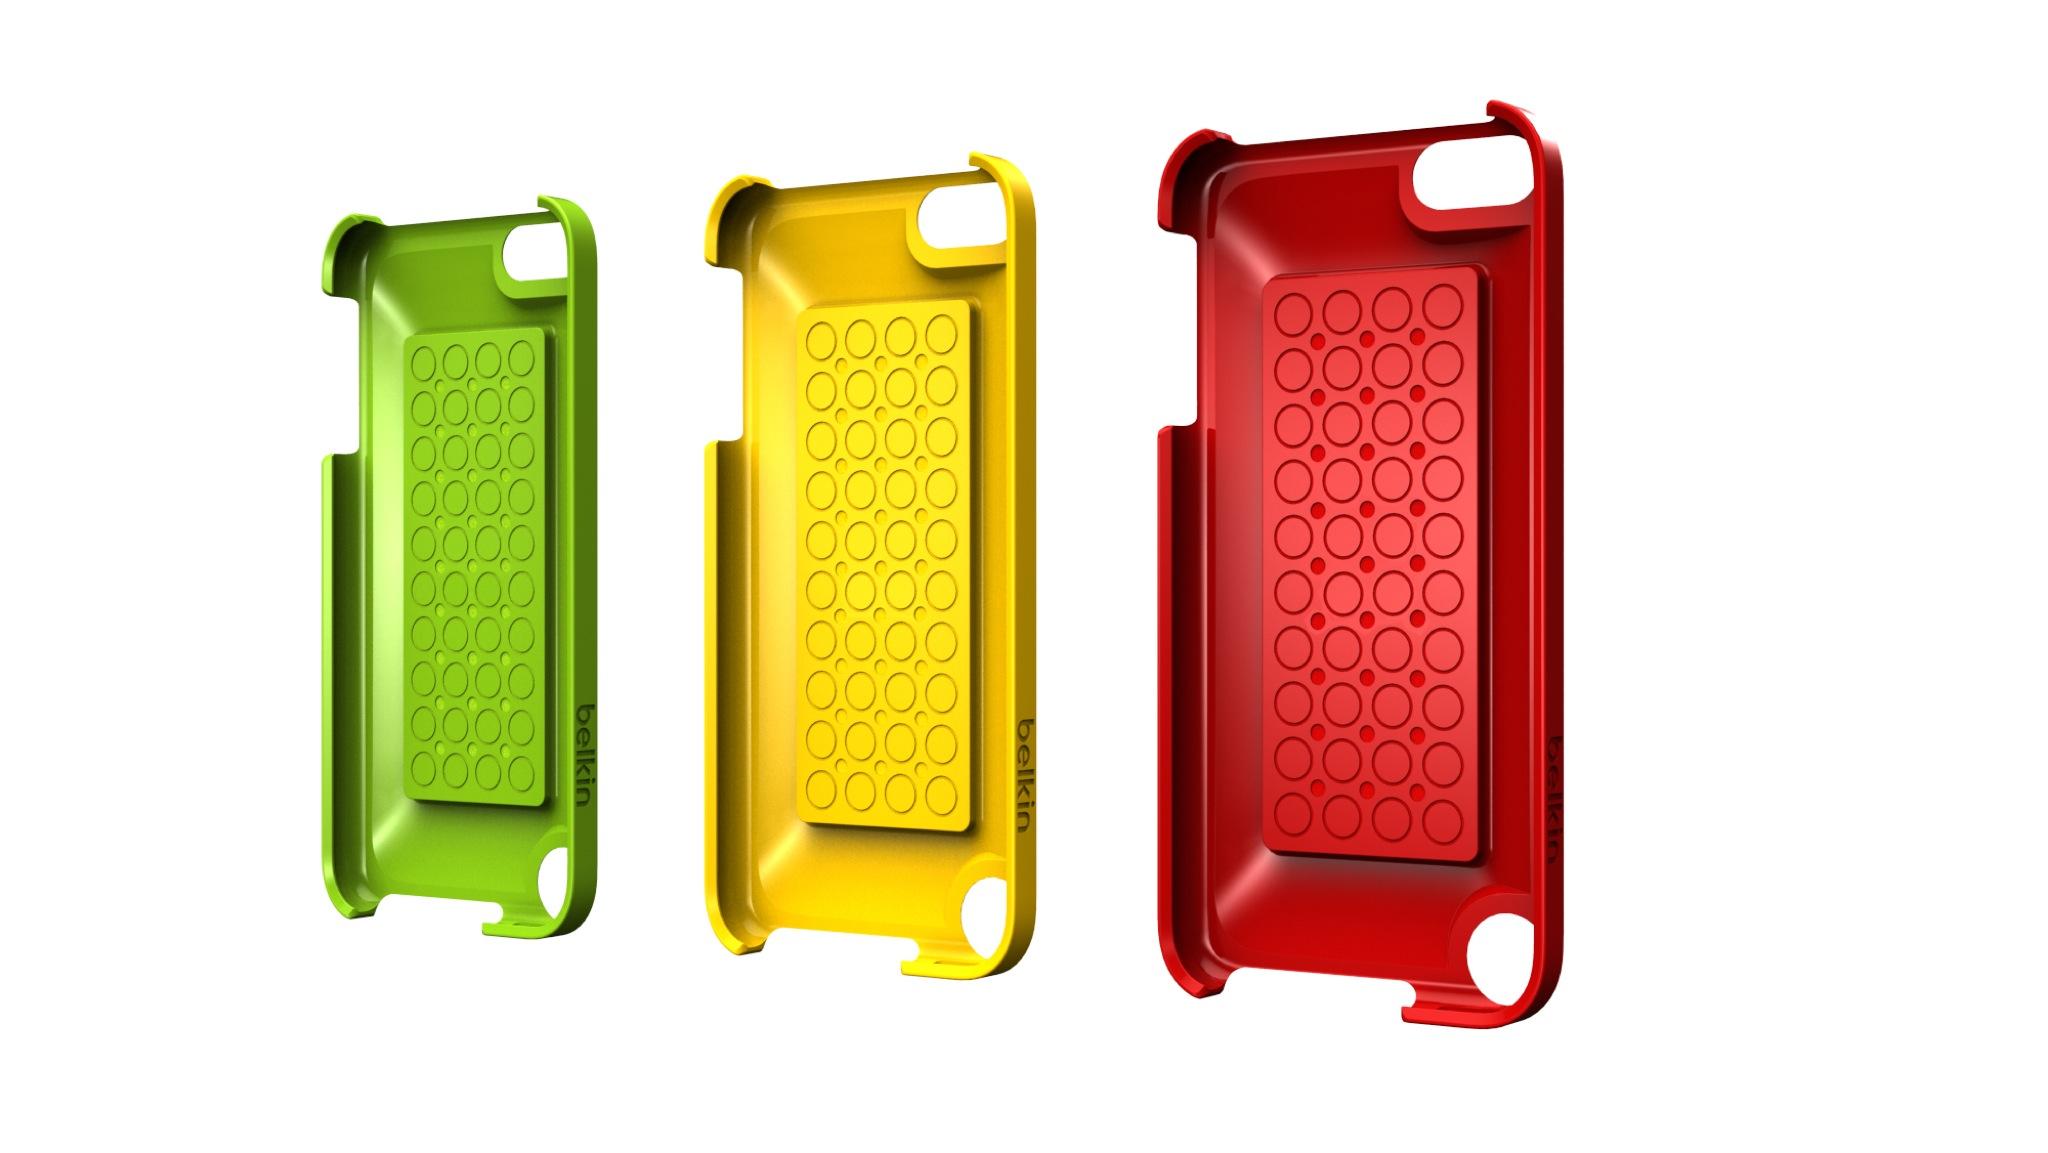 Belkin: iPhone-Hüllen aus Lego -